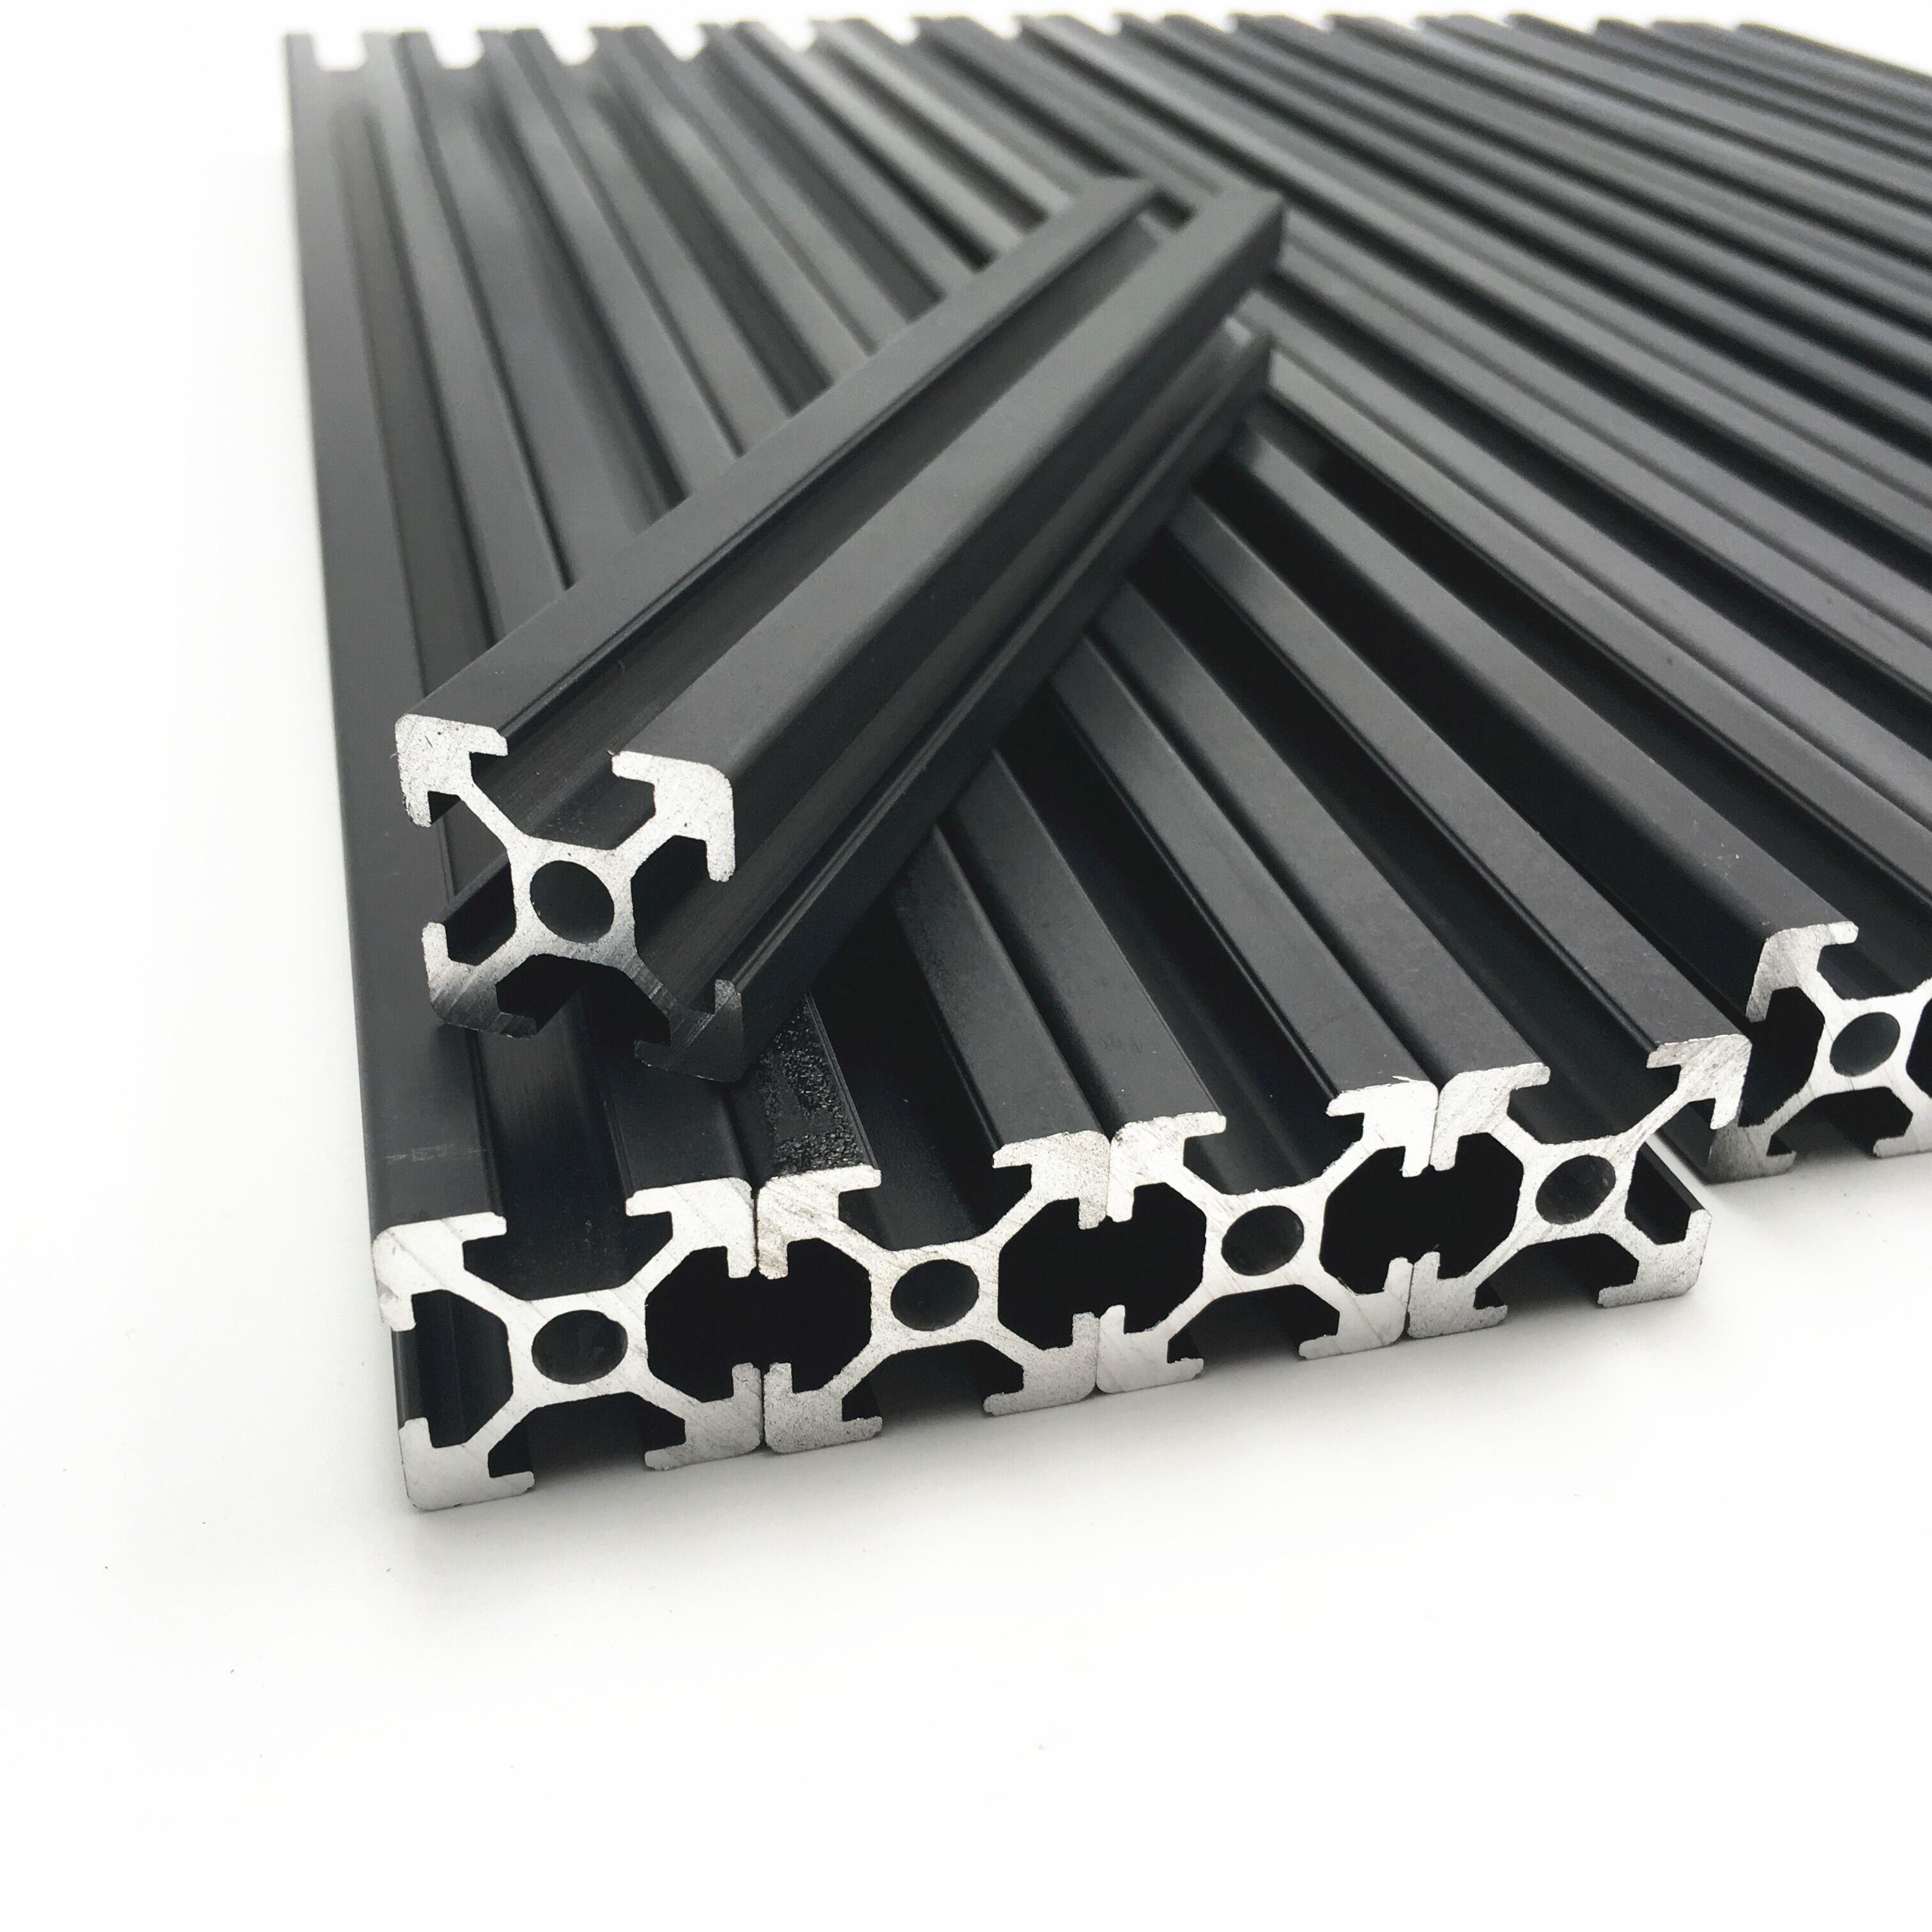 Aliexpress Buy 1set Hypercube 3d Printer Metal Frame Extrusion Amp Hardware Kit For Diy